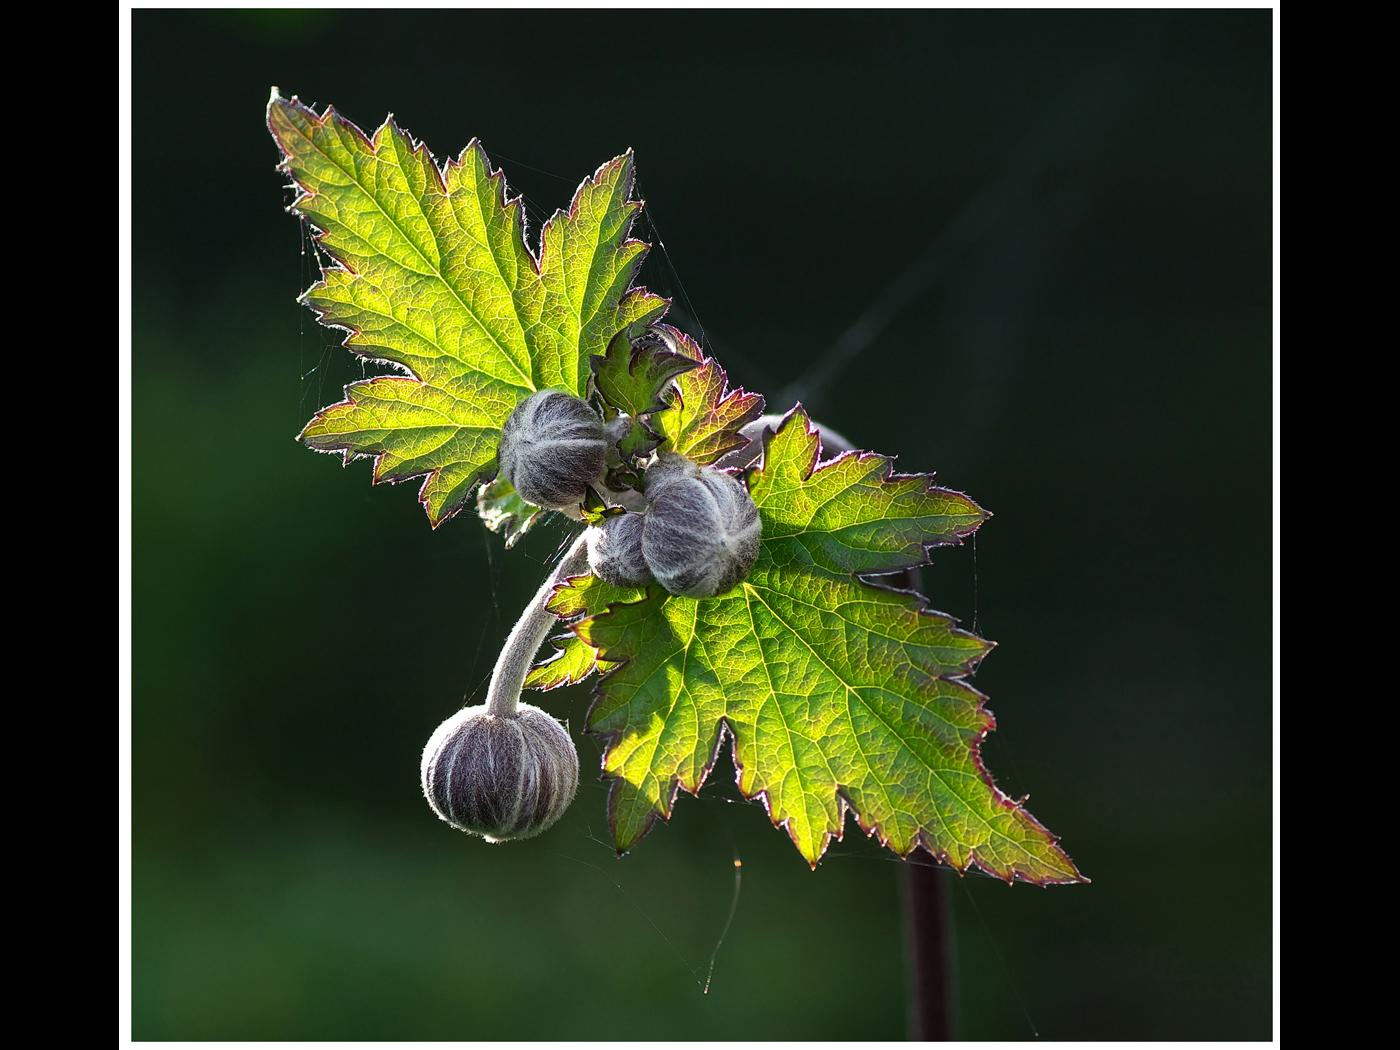 Japanese Anemone Leaf & Buds